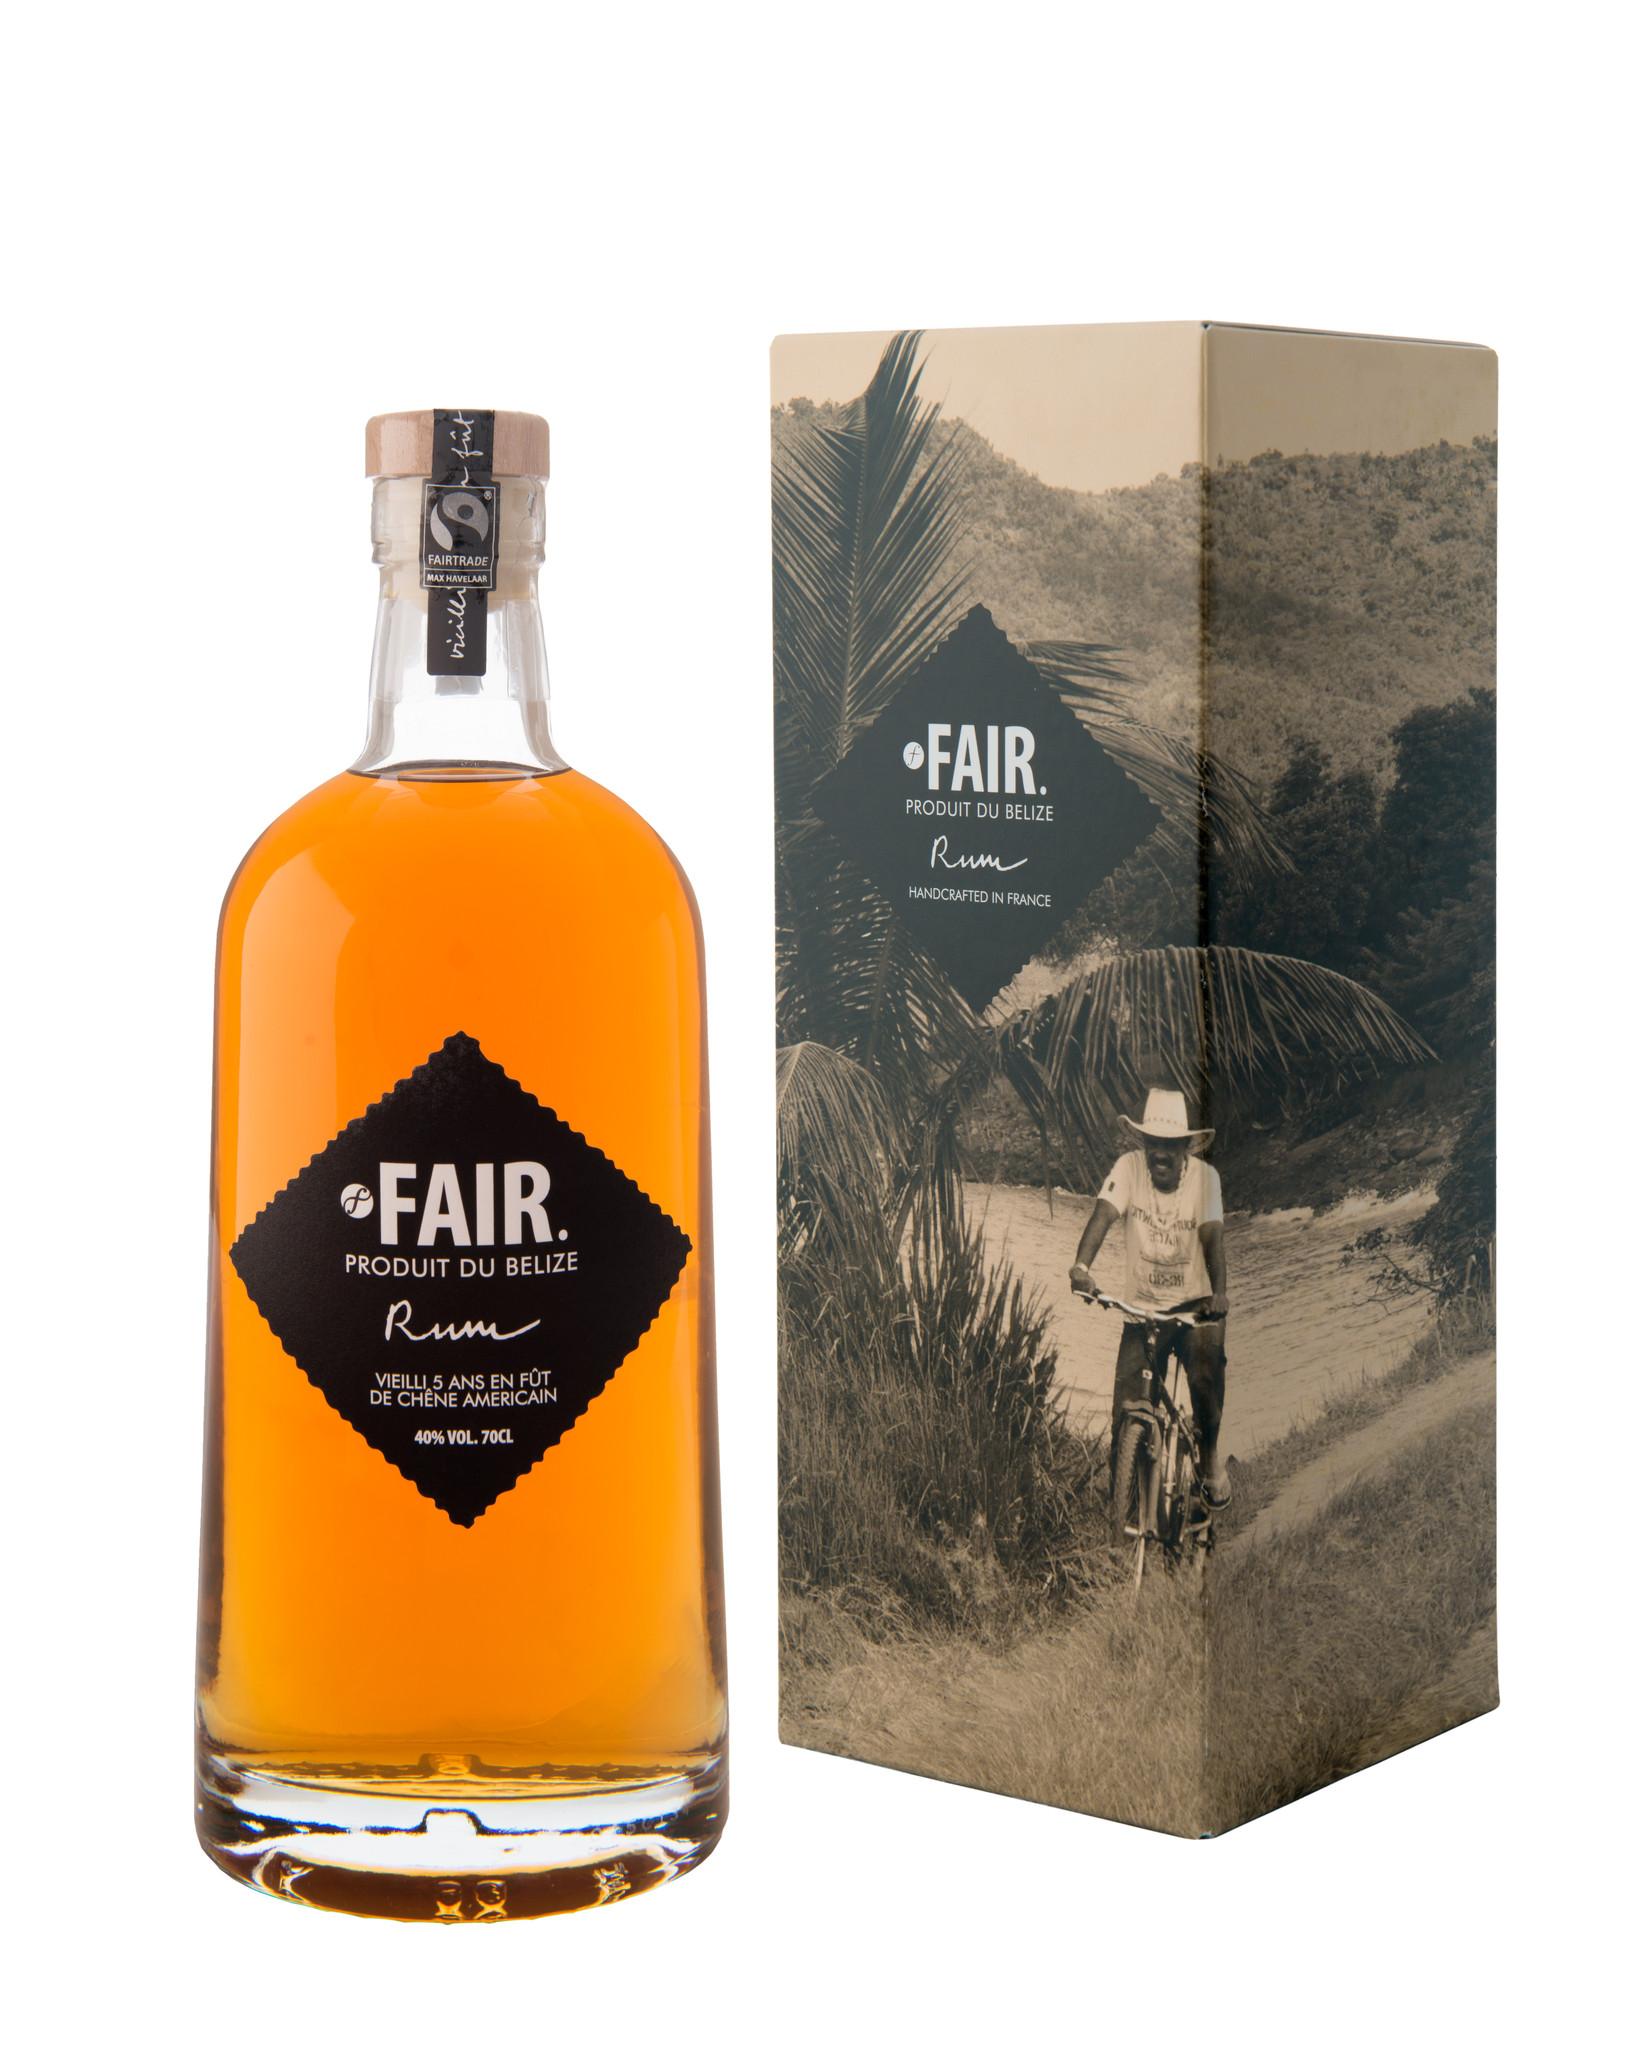 FAIR_Rum_BelizeJardins_Florian